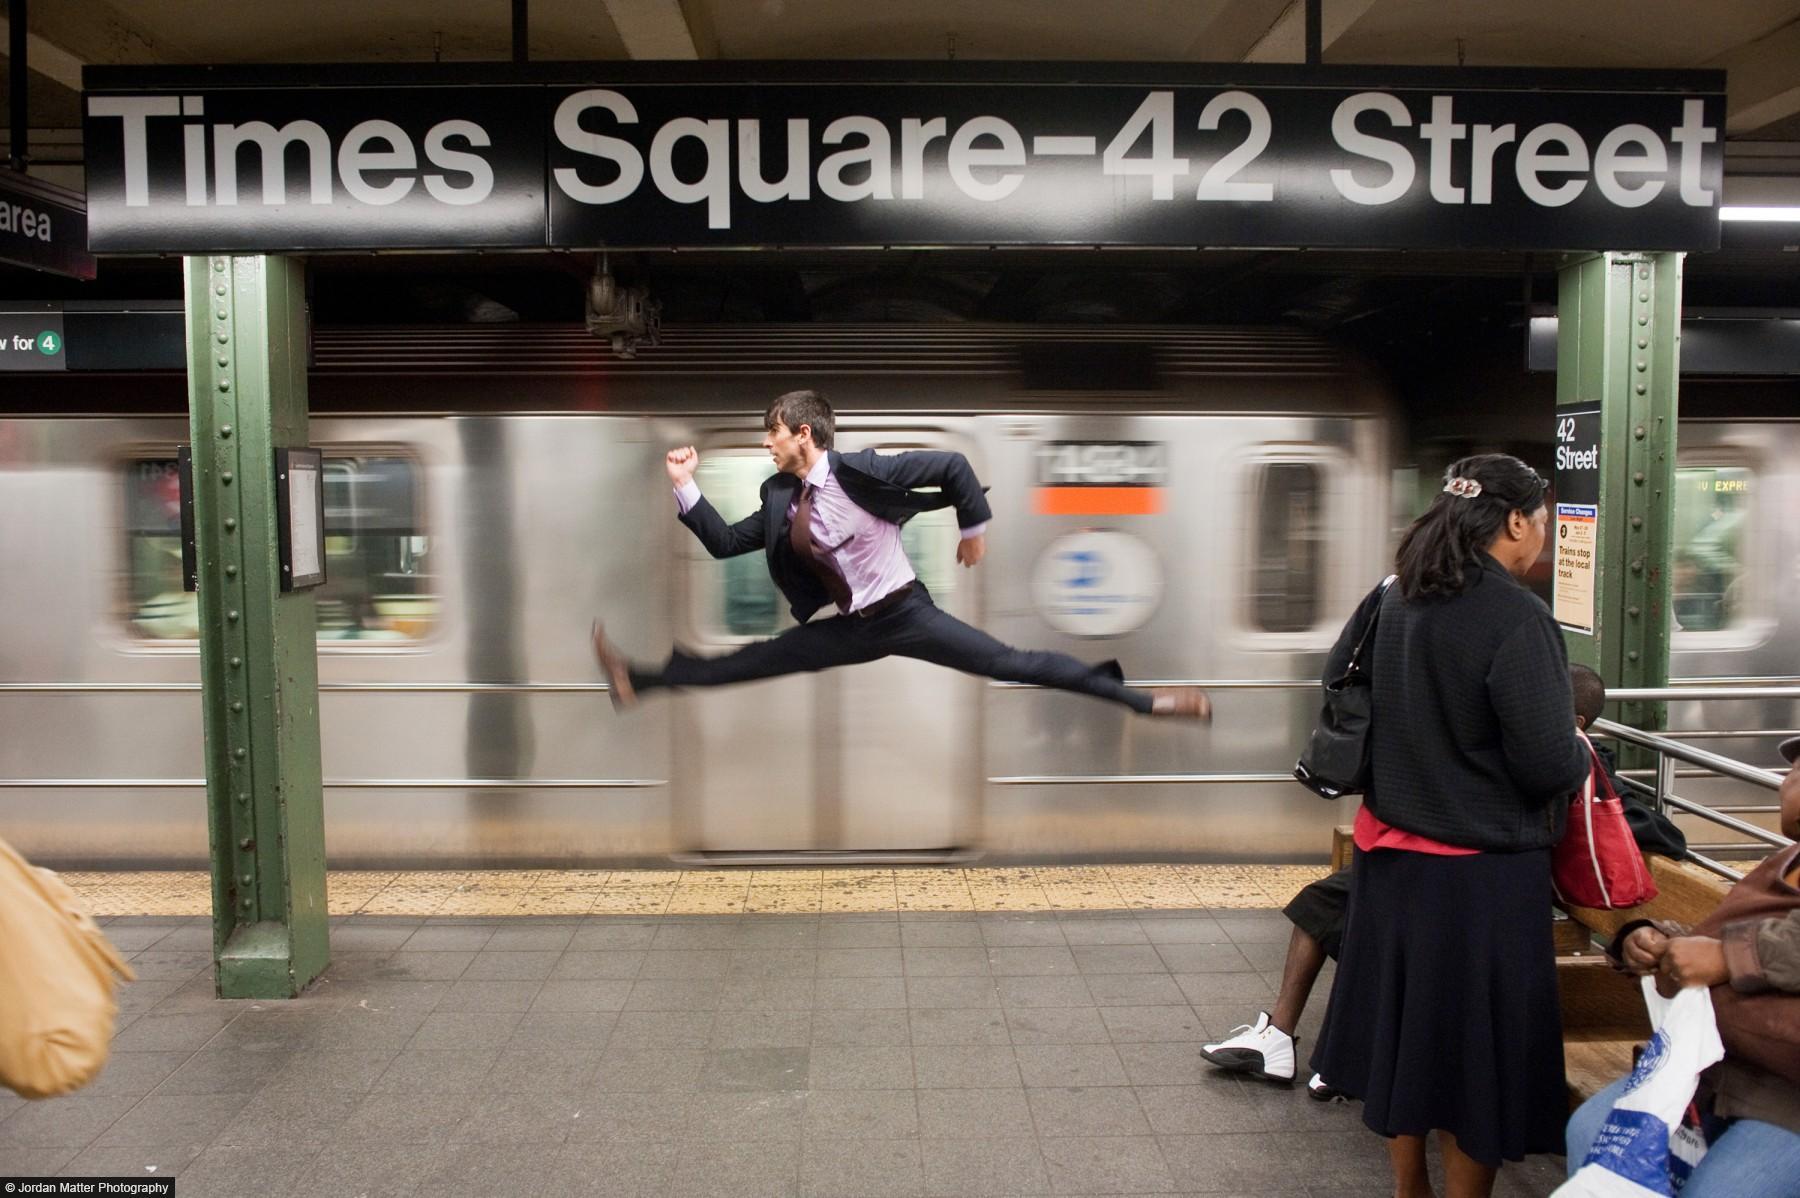 Dancers Among Us from Jordan Matter Photography